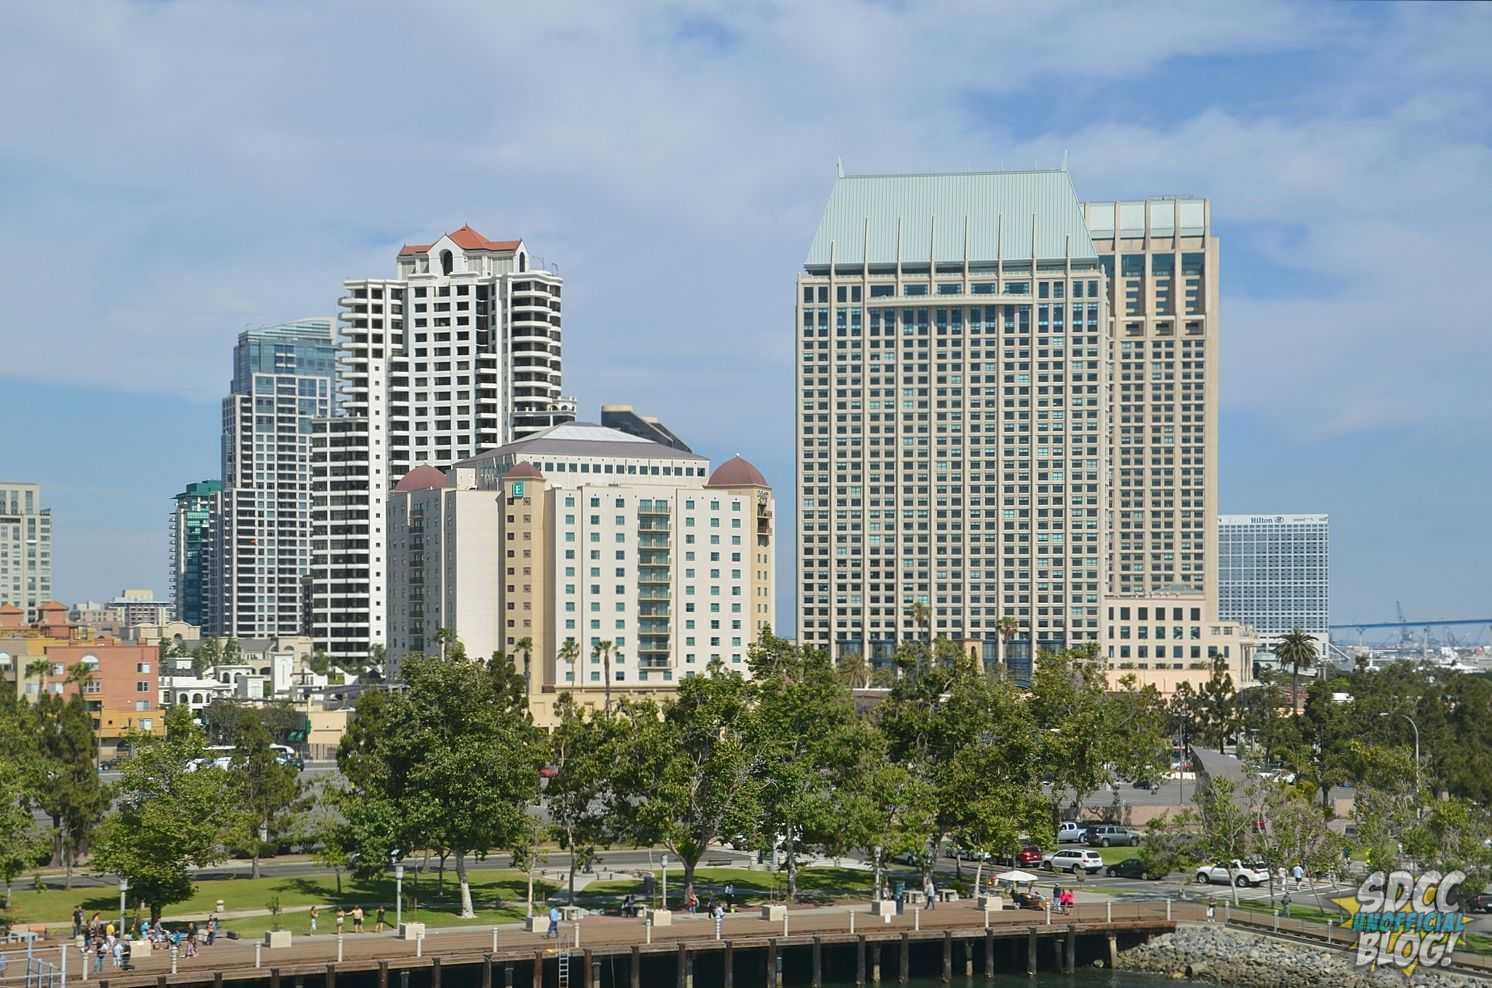 San Diego Hotels City View - Hyatt Embassy Hilton Early Bird